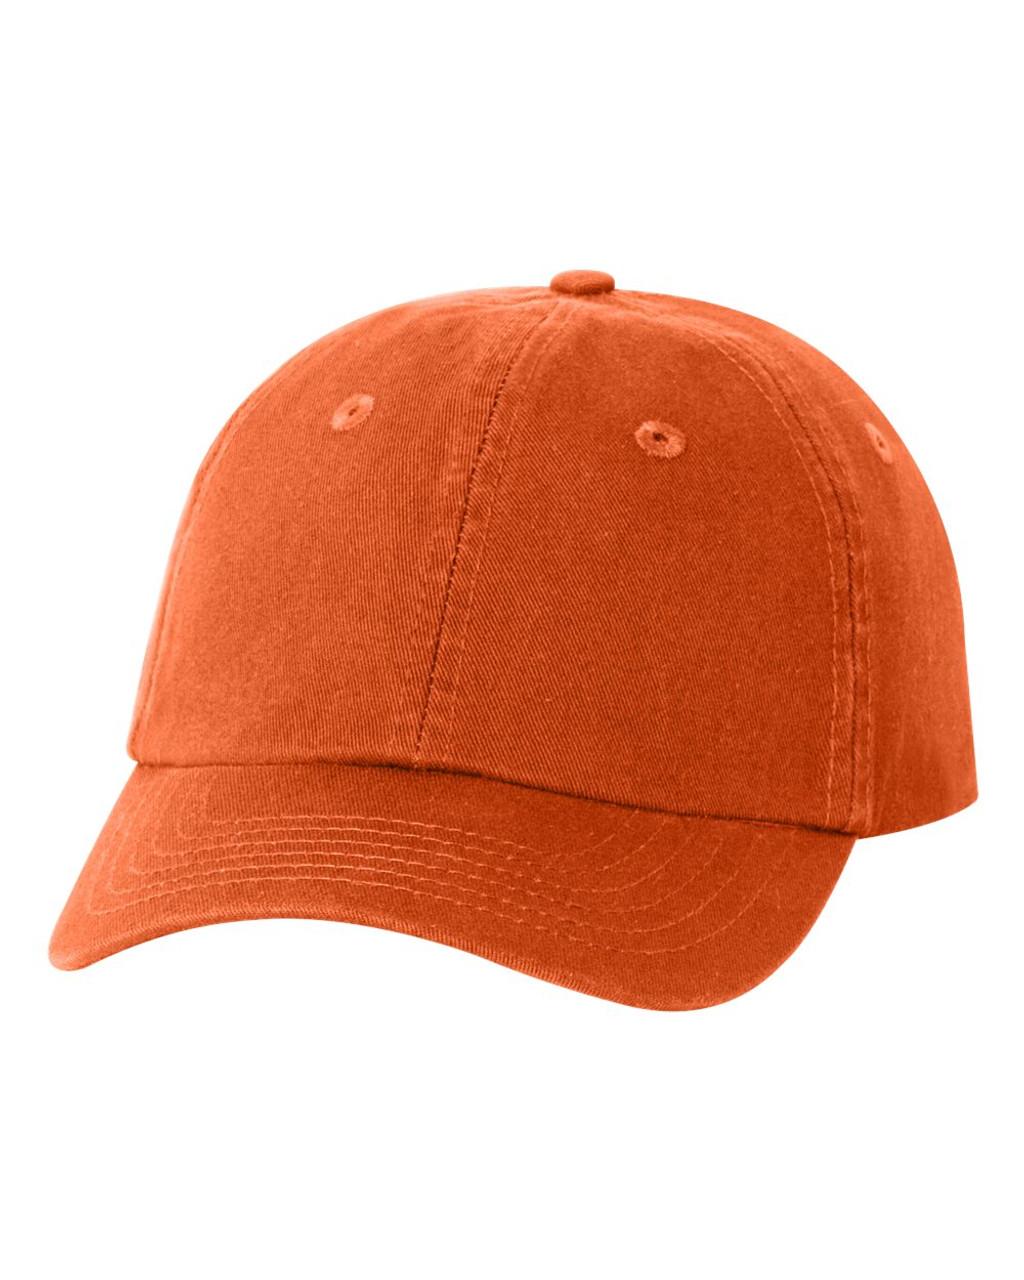 VC300Y Valucap Youth Twill Cap | T-shirt.ca